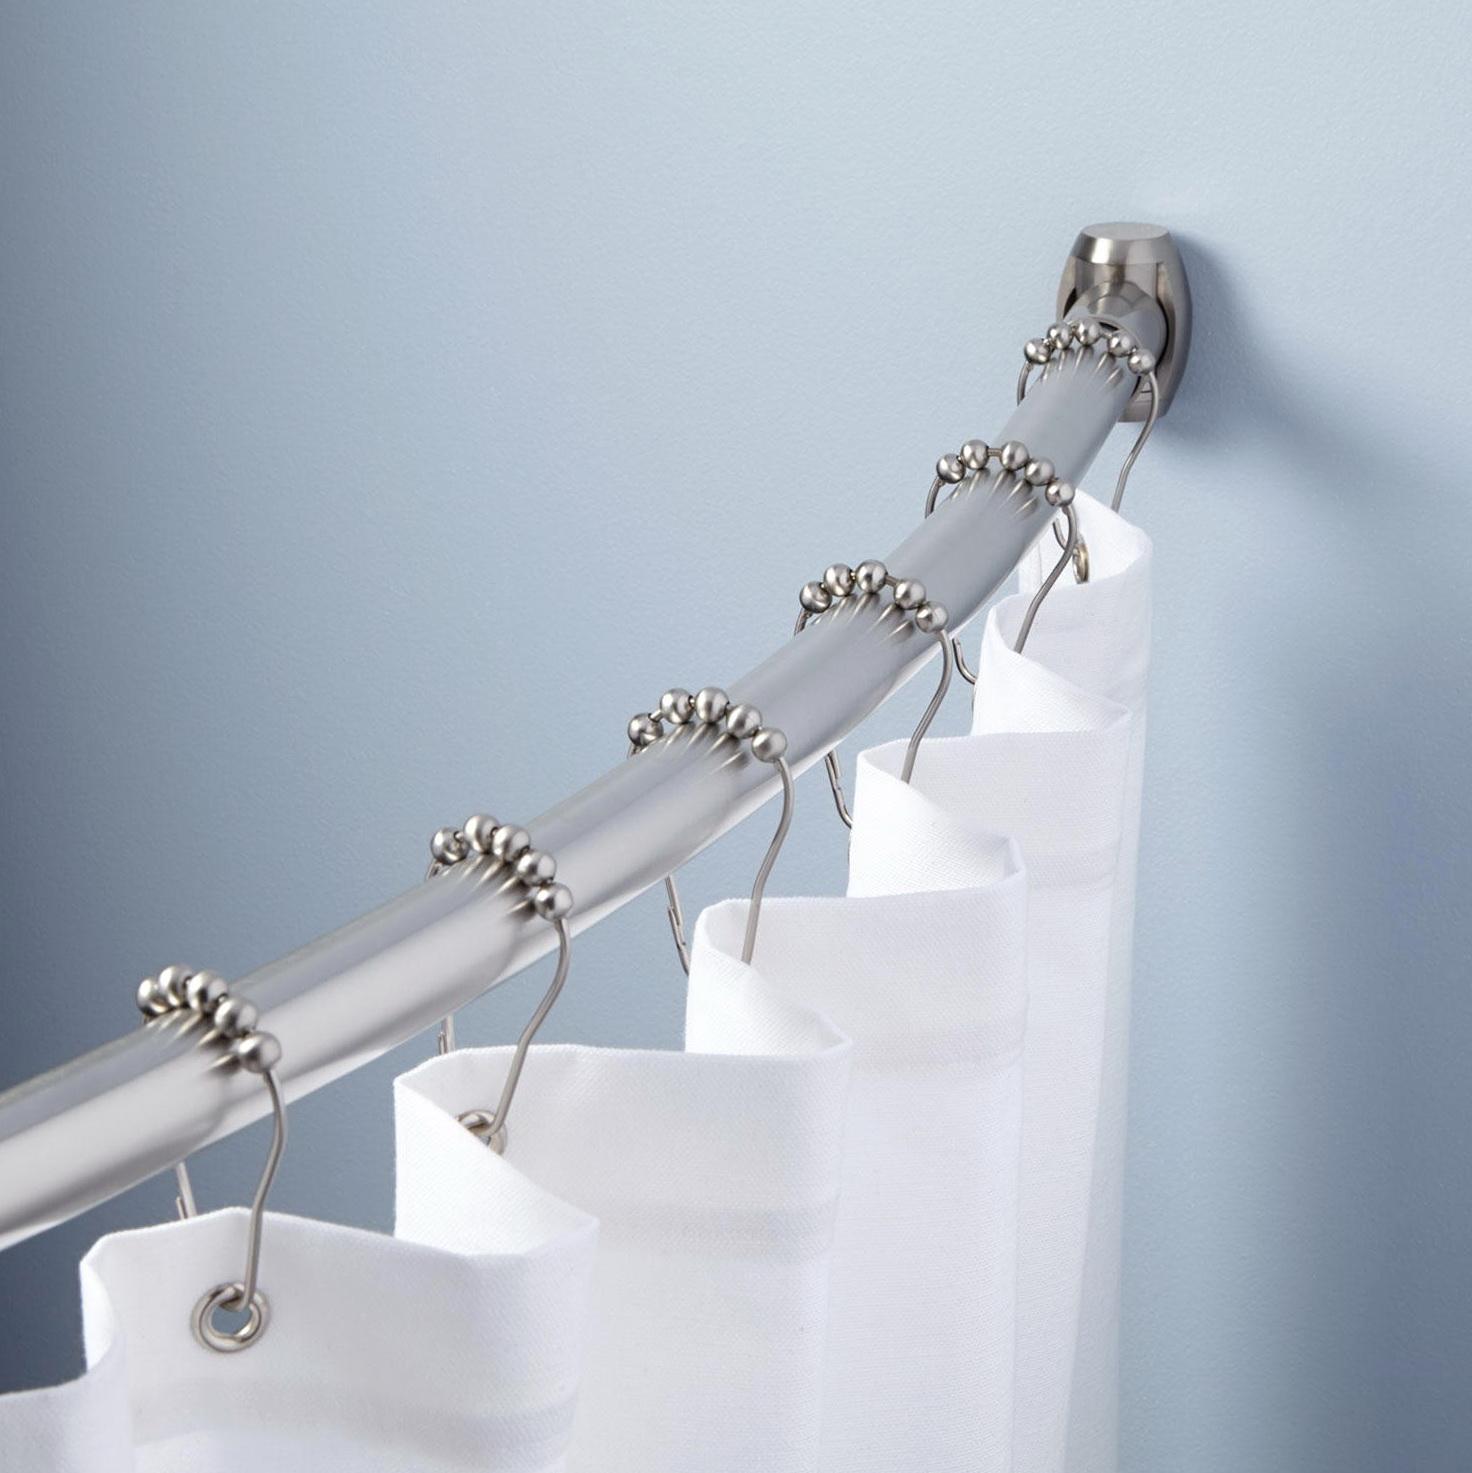 Restoration Hardware Shower Curtain Rod